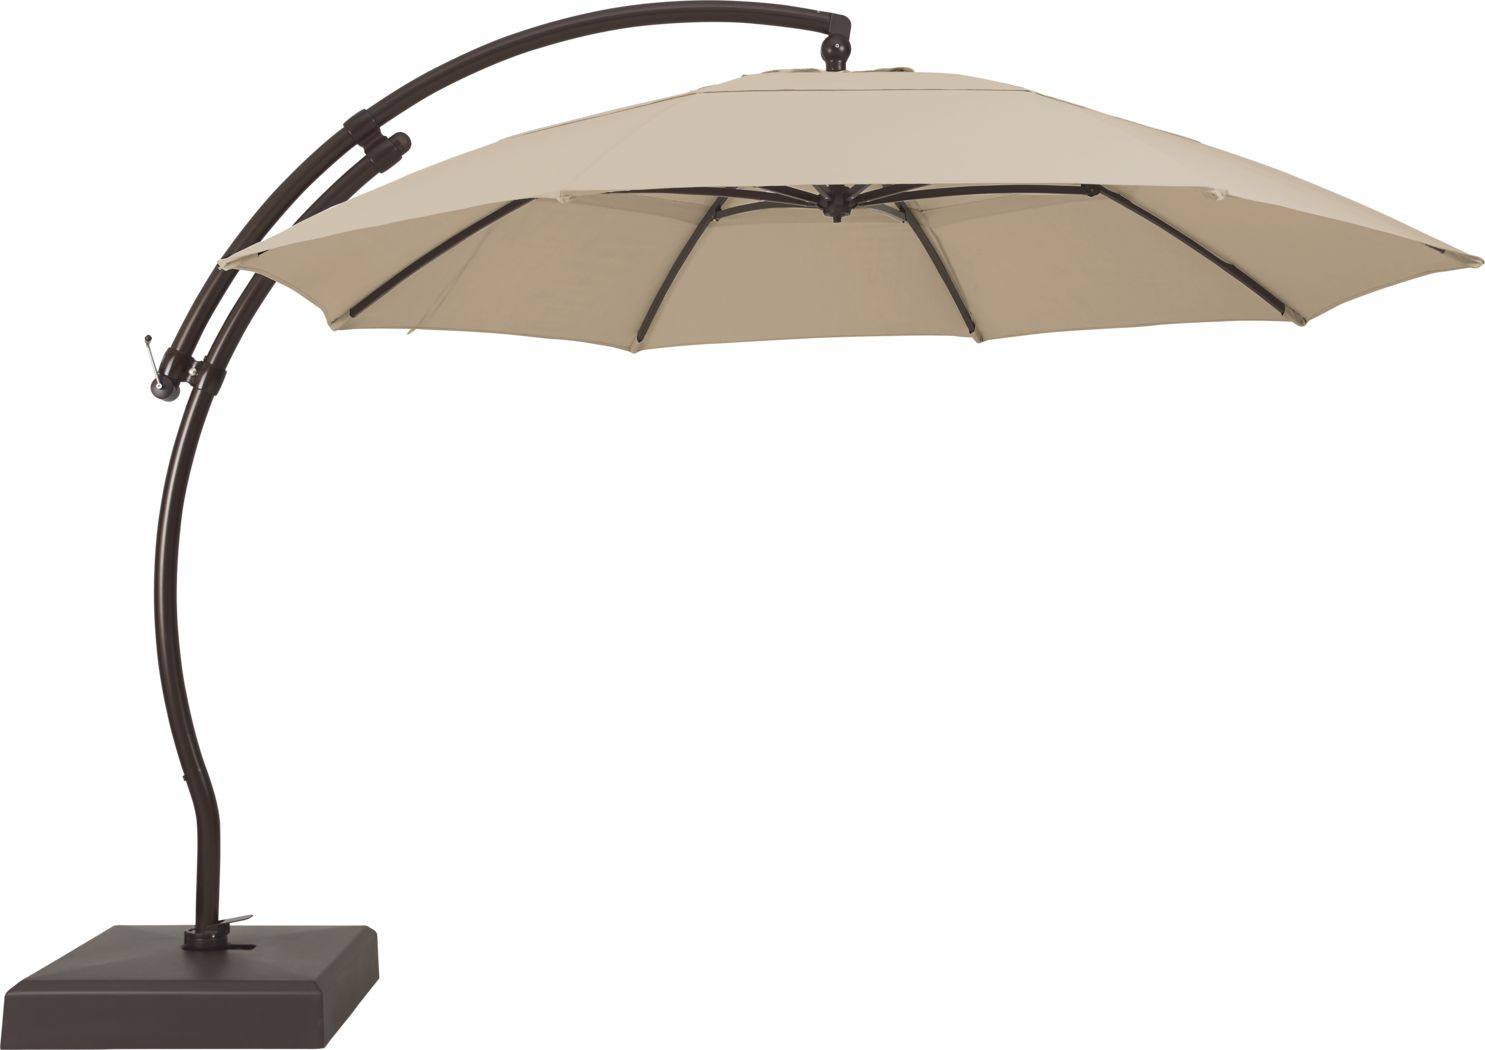 La Mesa Cove 13' Stone Outdoor Curve Cantilever Umbrella with Base and Stand